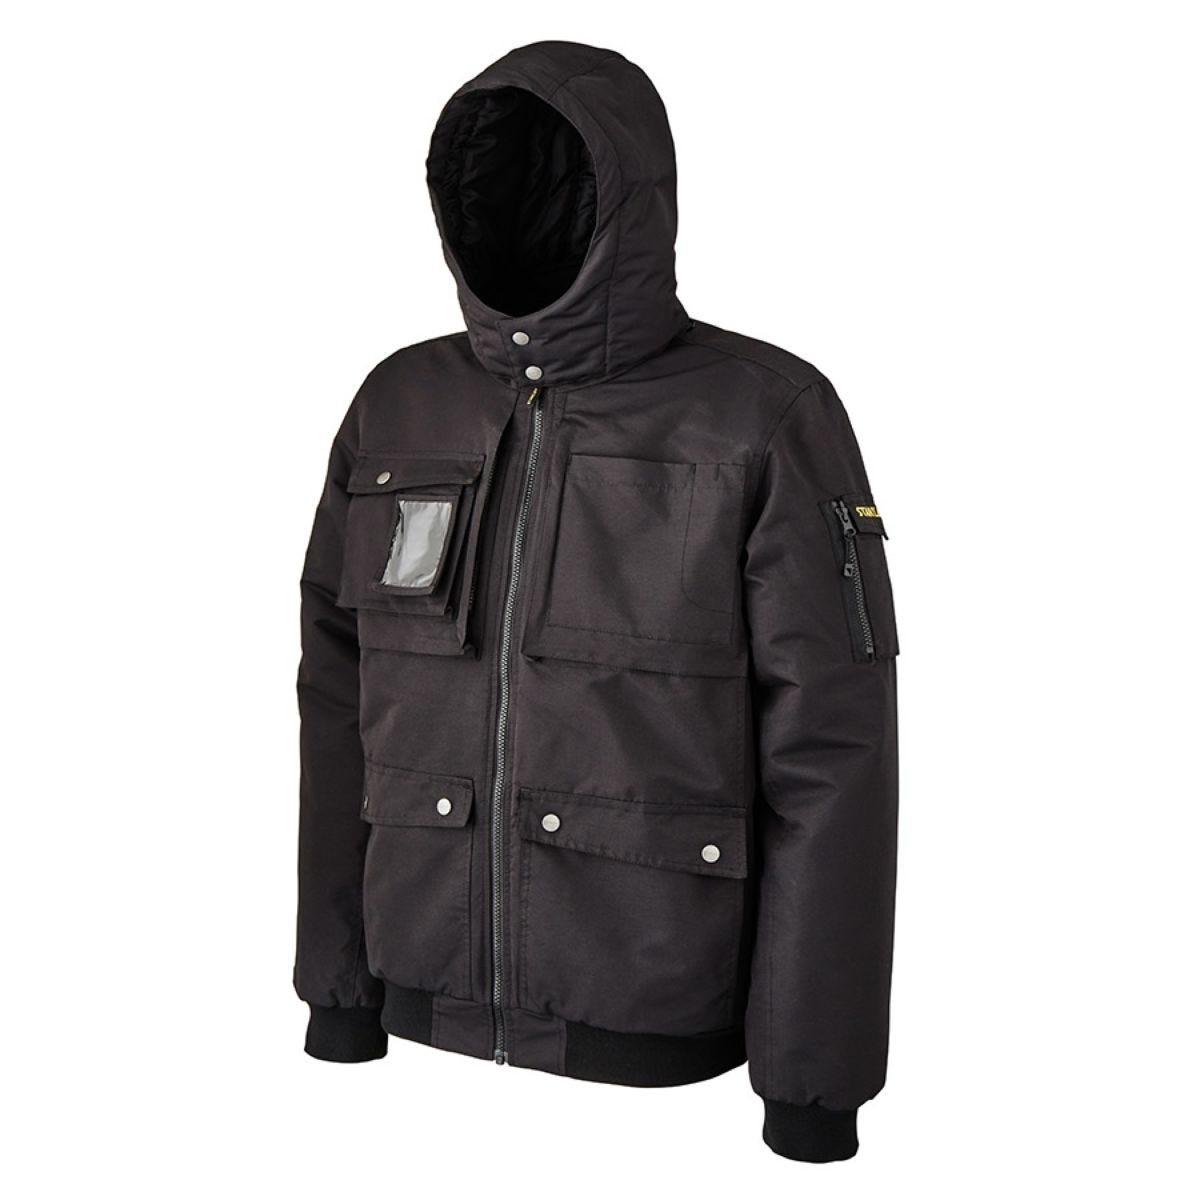 Stanley Workwear Toledo Bomber Waterproof Jacket with Multiple Tool Pockets - Black